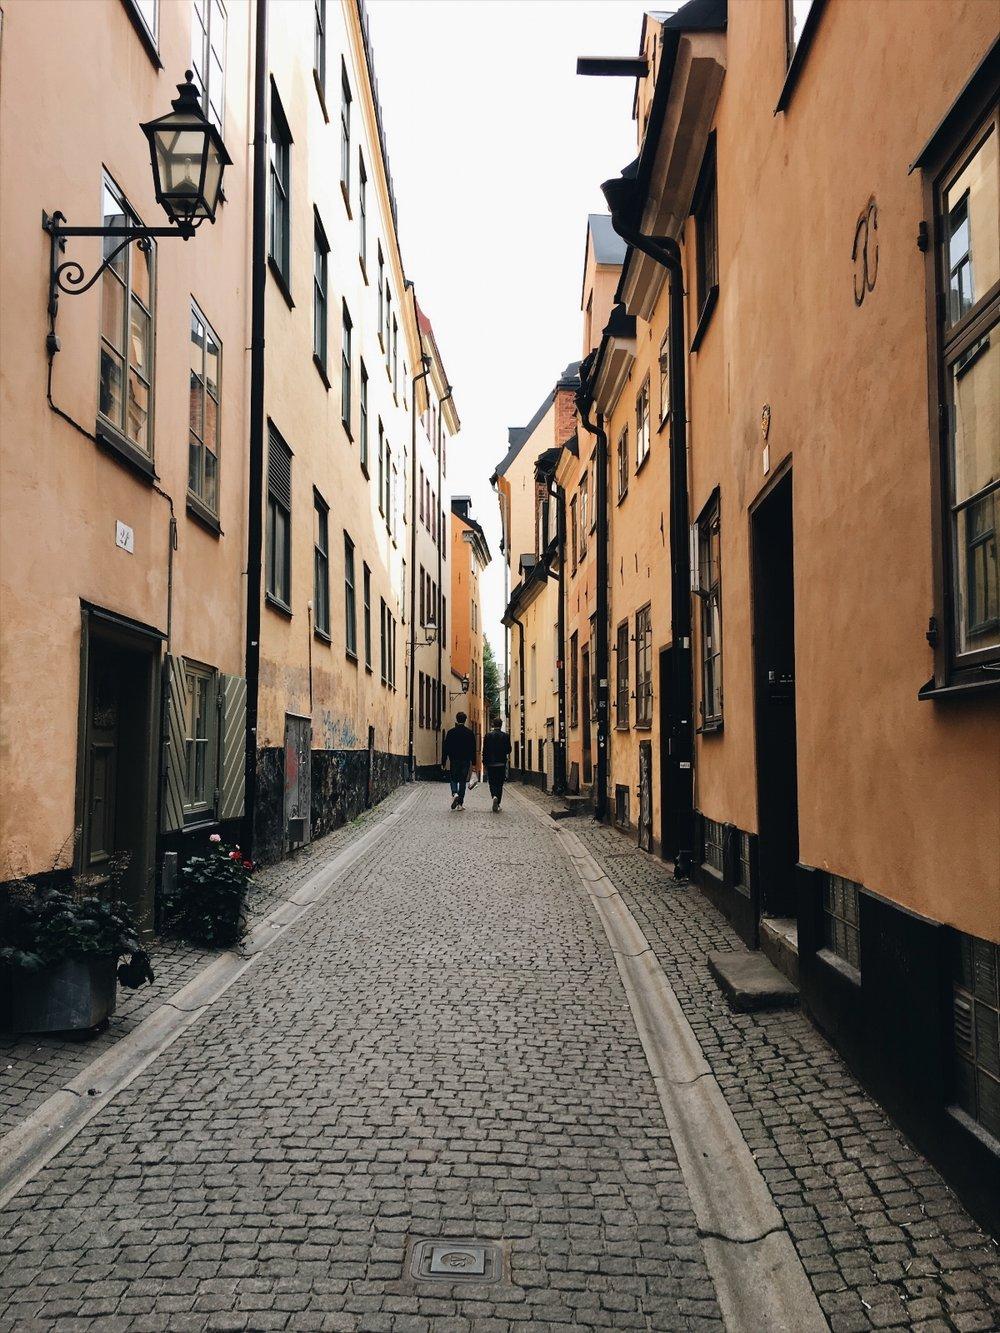 70a95-seesoomuch_stockholm_sweden_3.jpg